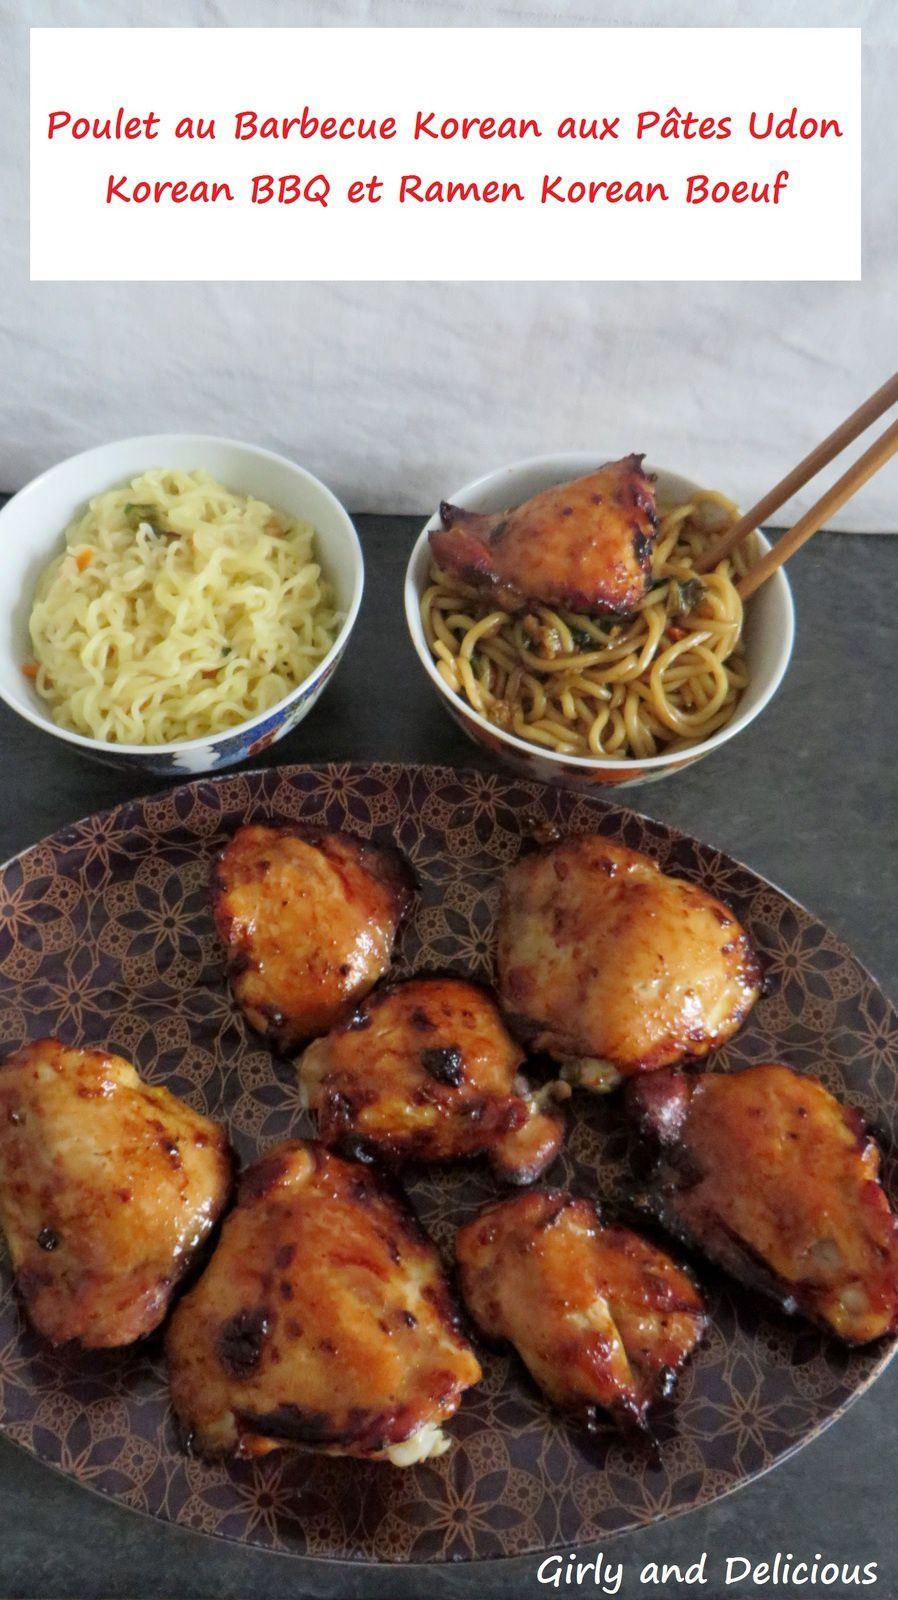 Poulet au Barbecue Korean et ses Pâtes Udon  Korean BBQ et Ramen Korean Boeuf